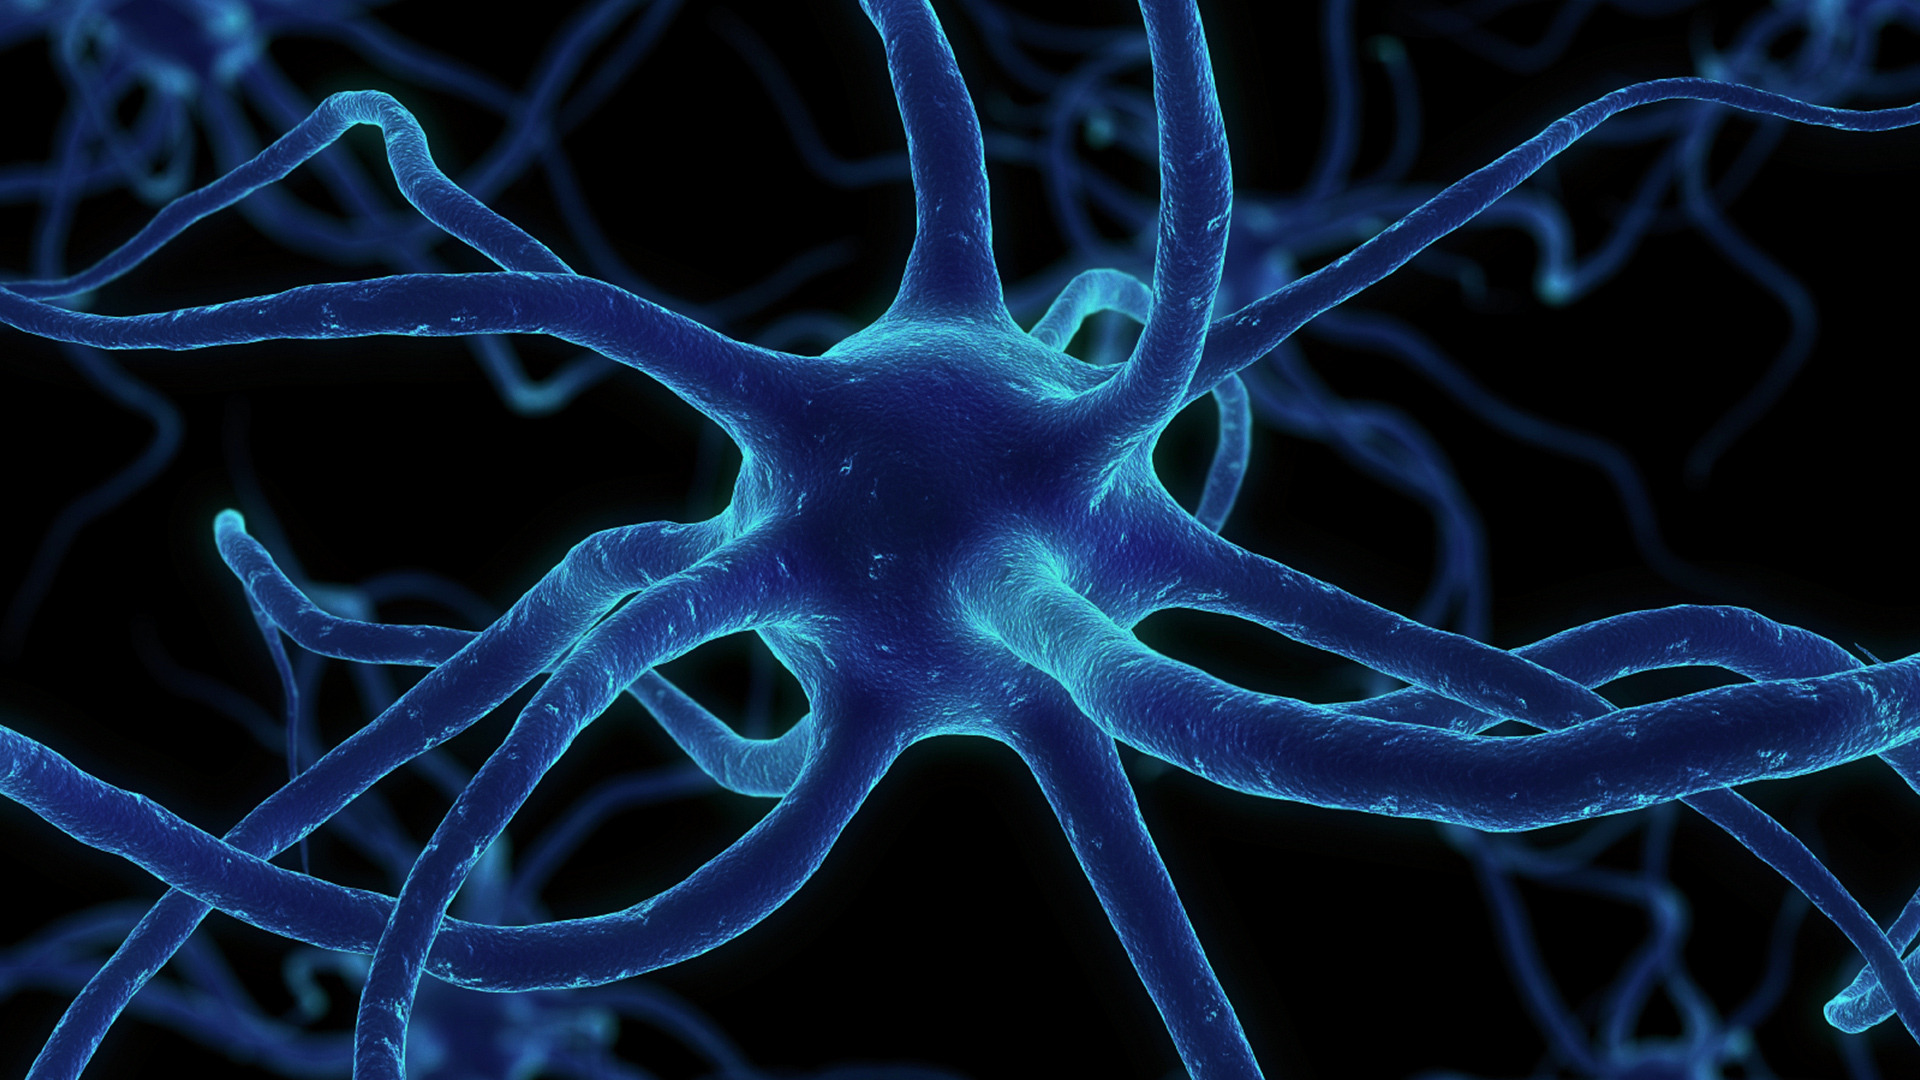 Synapsen-1-von-www-d-g-e-n-e-r-a-c-i-o-n-com